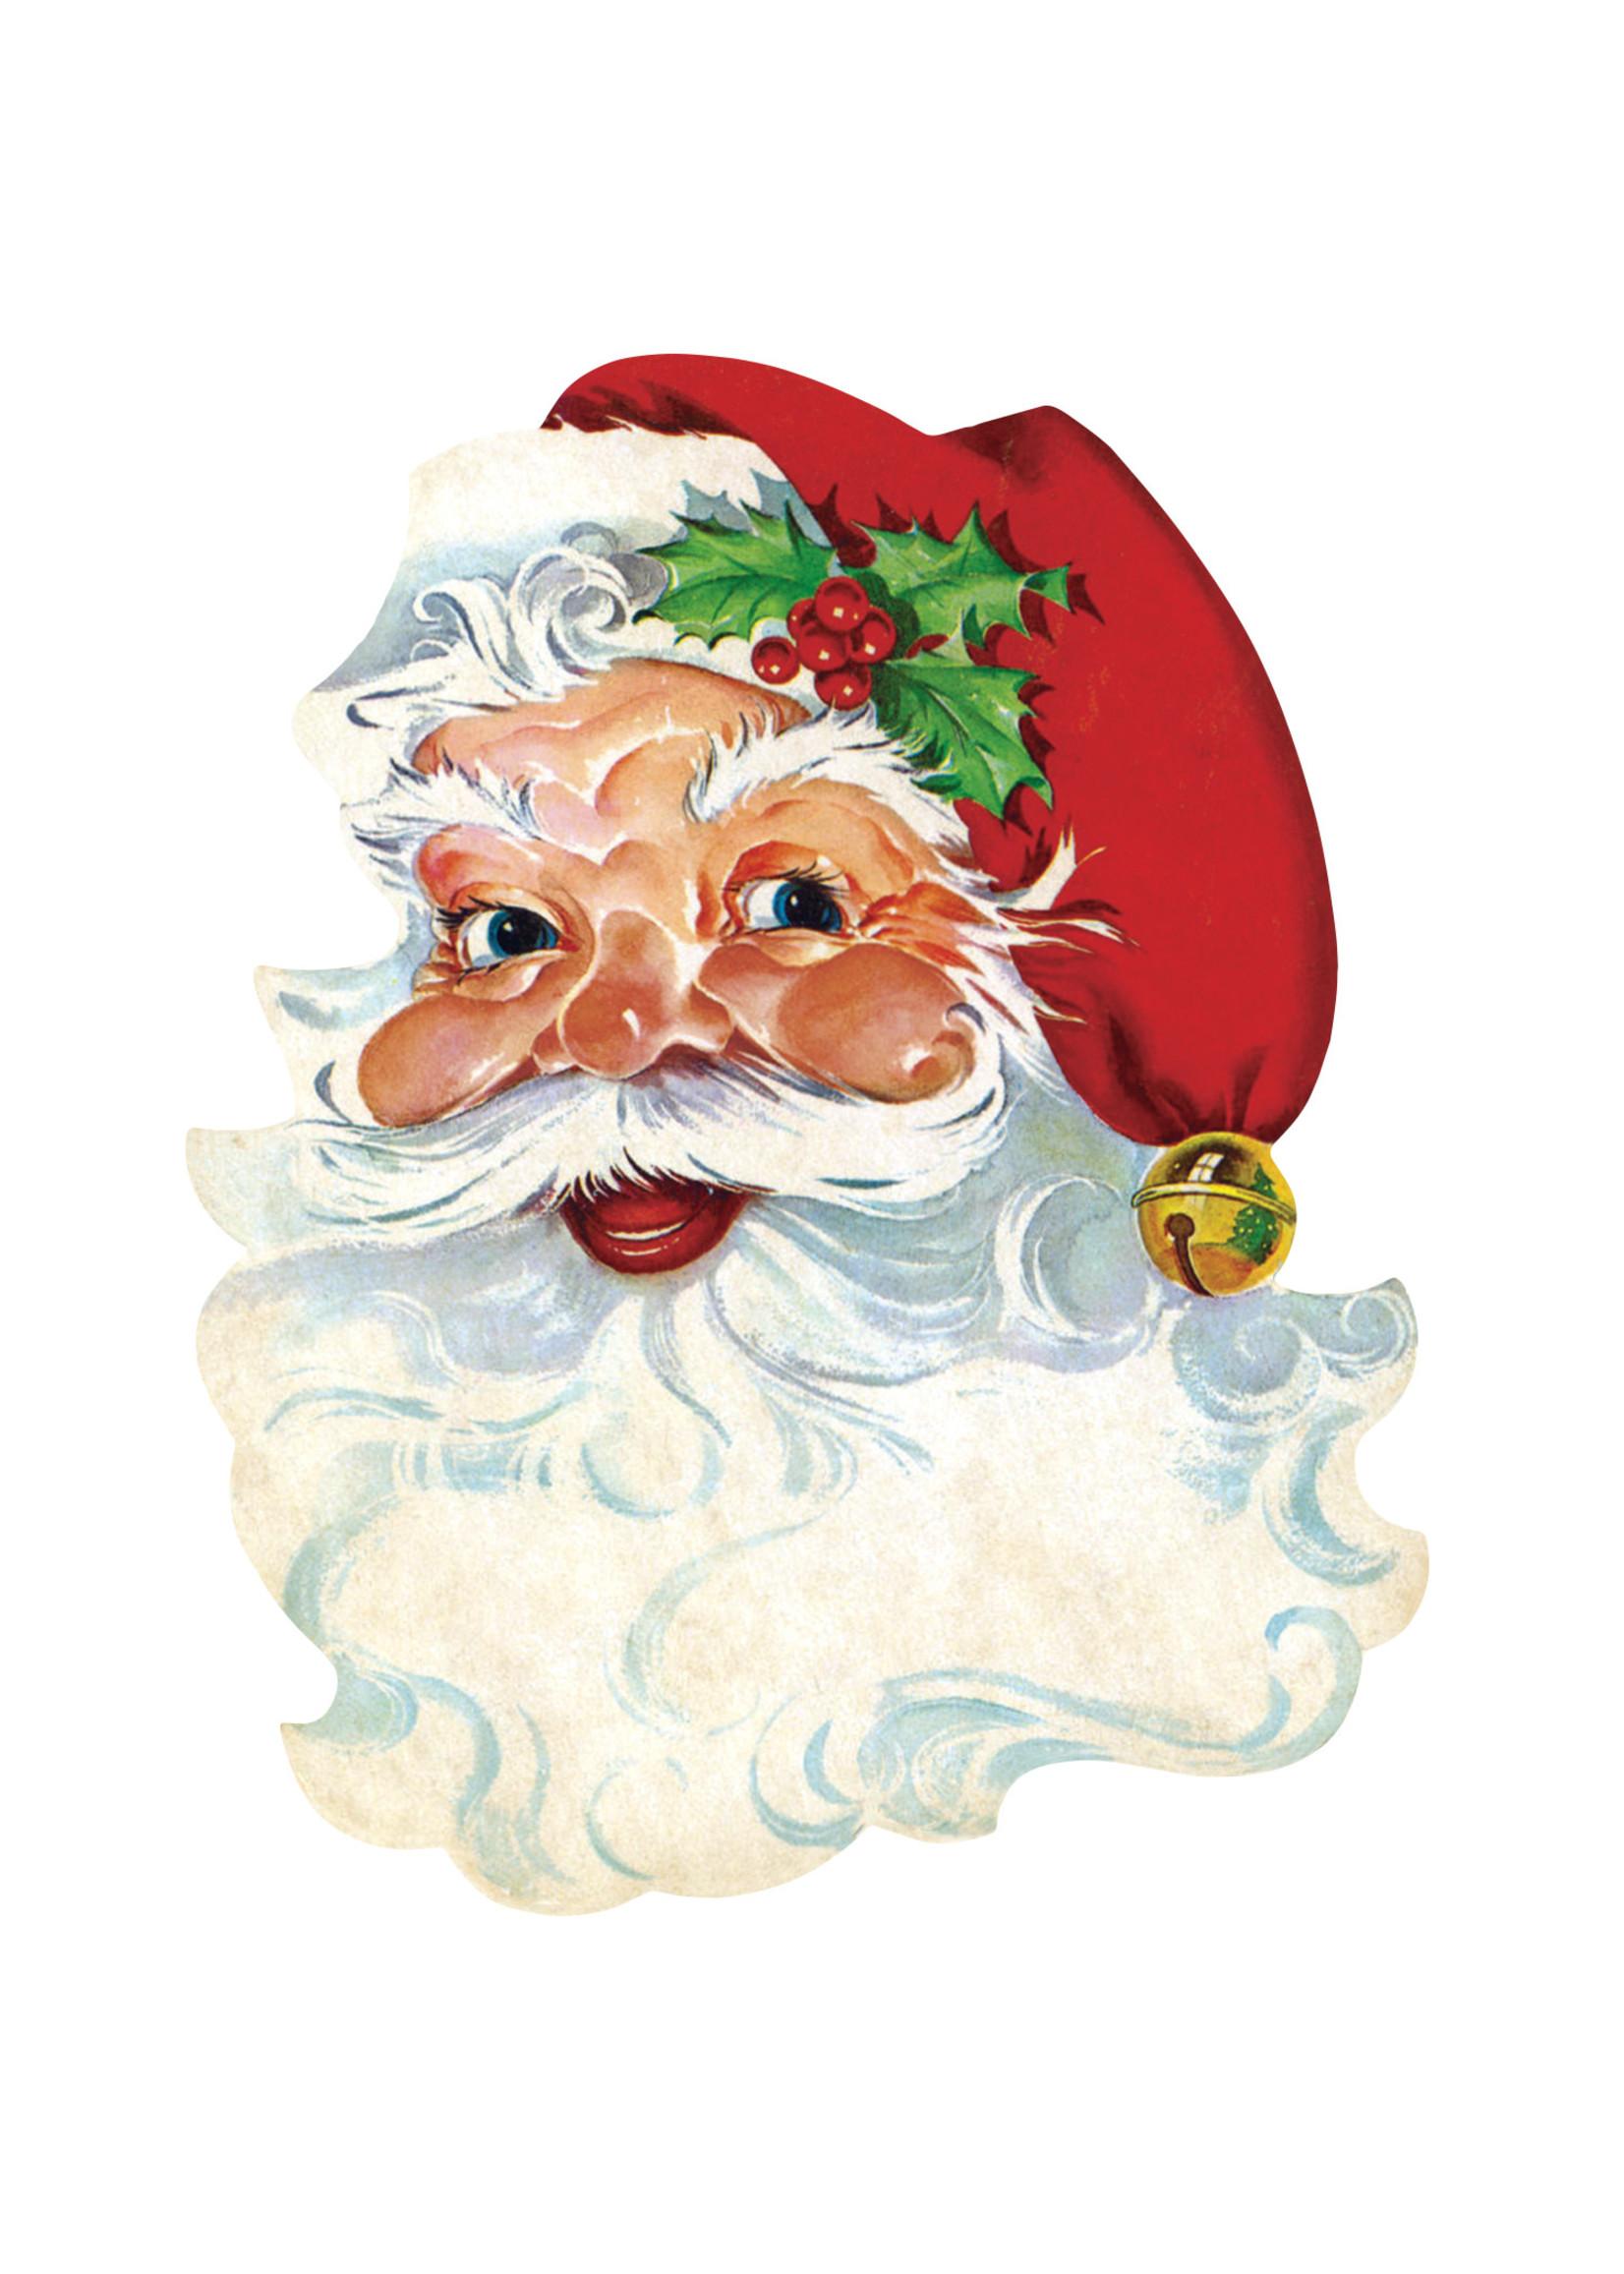 Hester & Cook Paper Placemats - Santa (12 sheets)